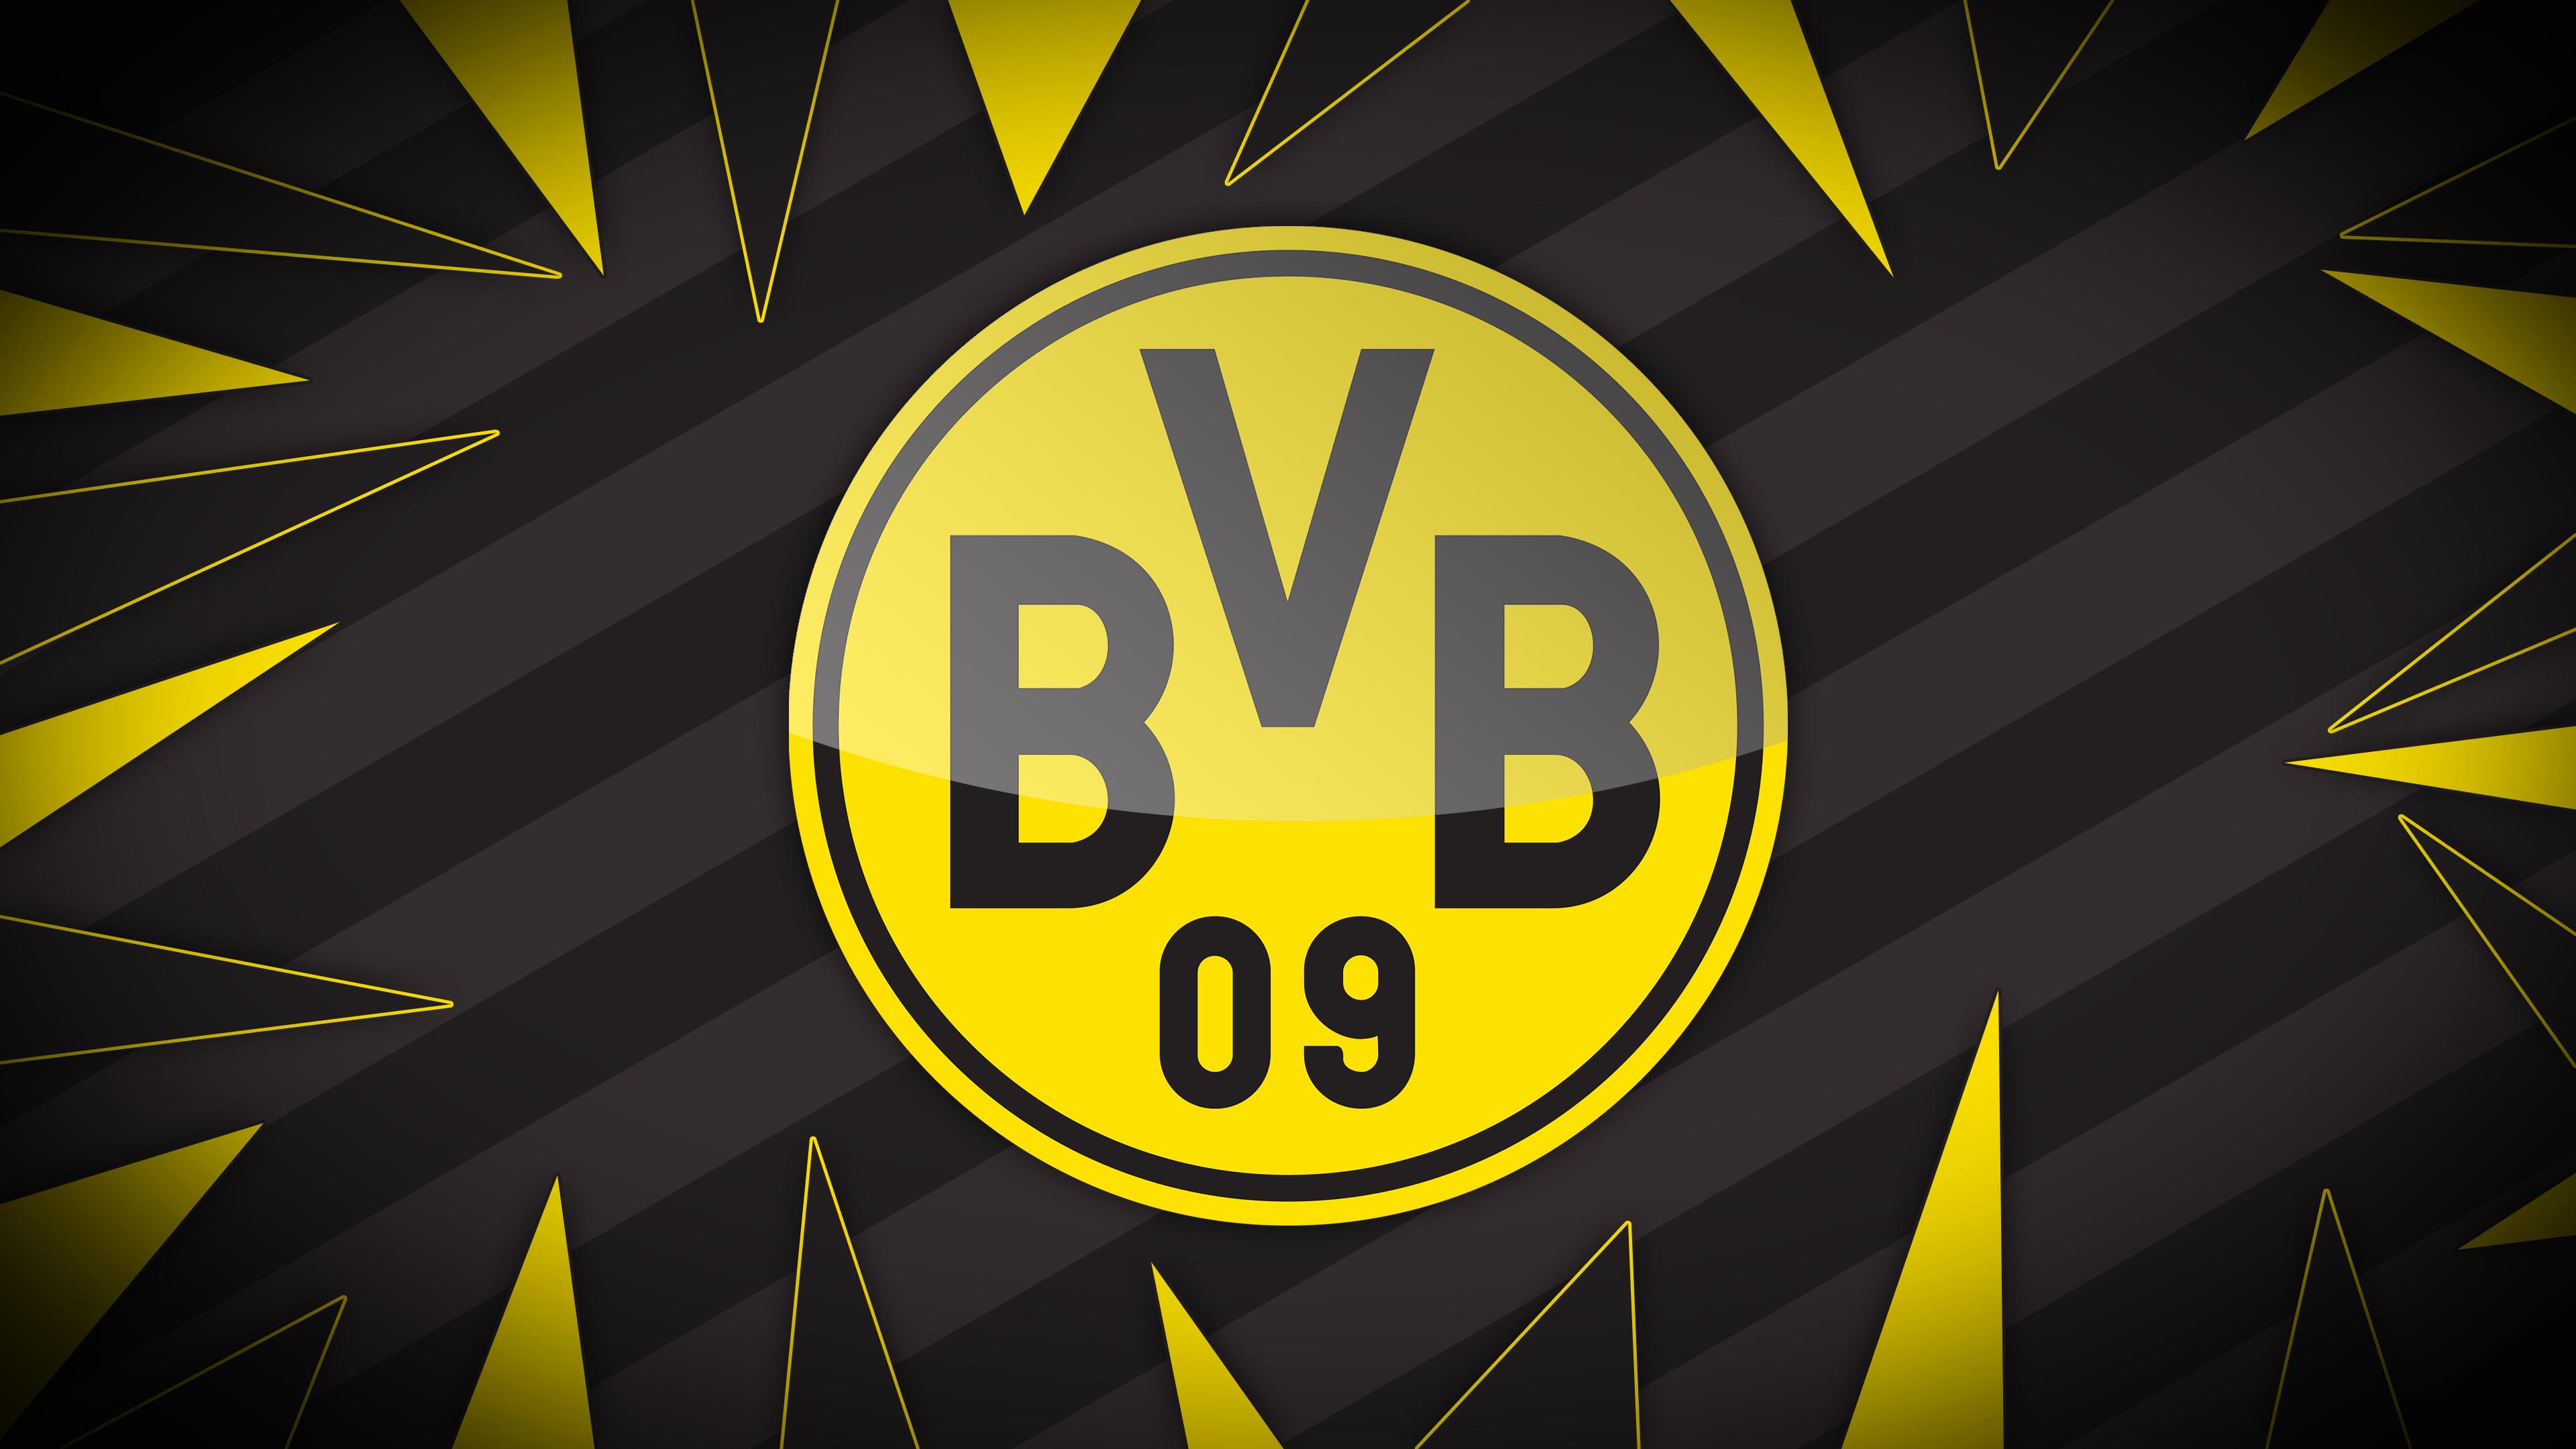 Bvb Borussia Dortmund Emblem Logo Soccer Wallpaper Resolution 3840x2160 Id 1062161 Wallha Com